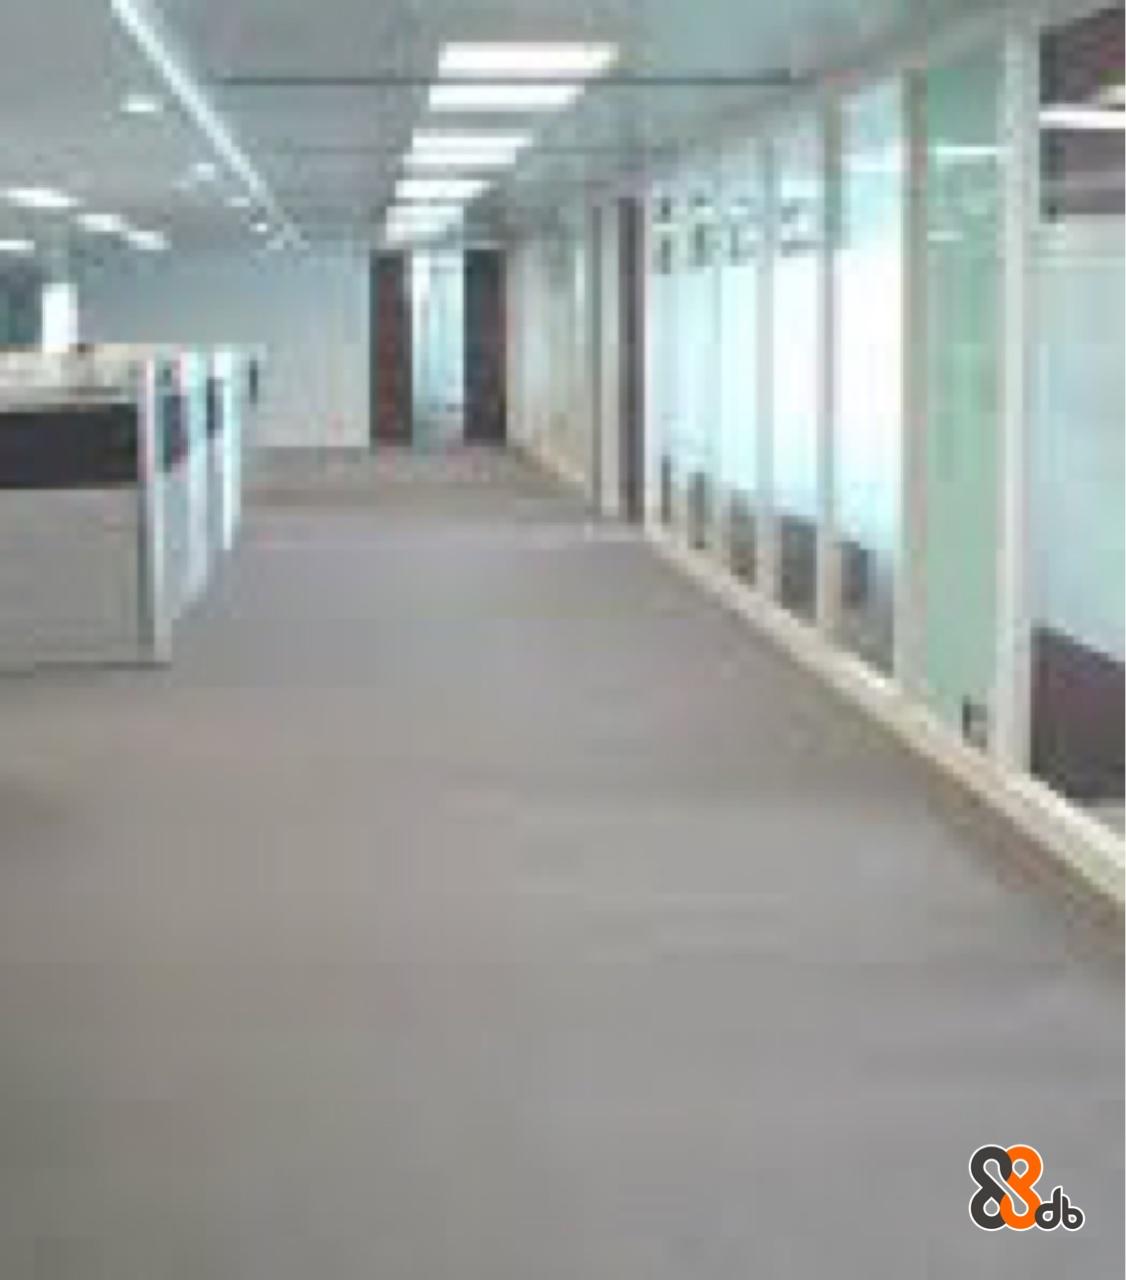 db  Building,Floor,Ceiling,Flooring,Office